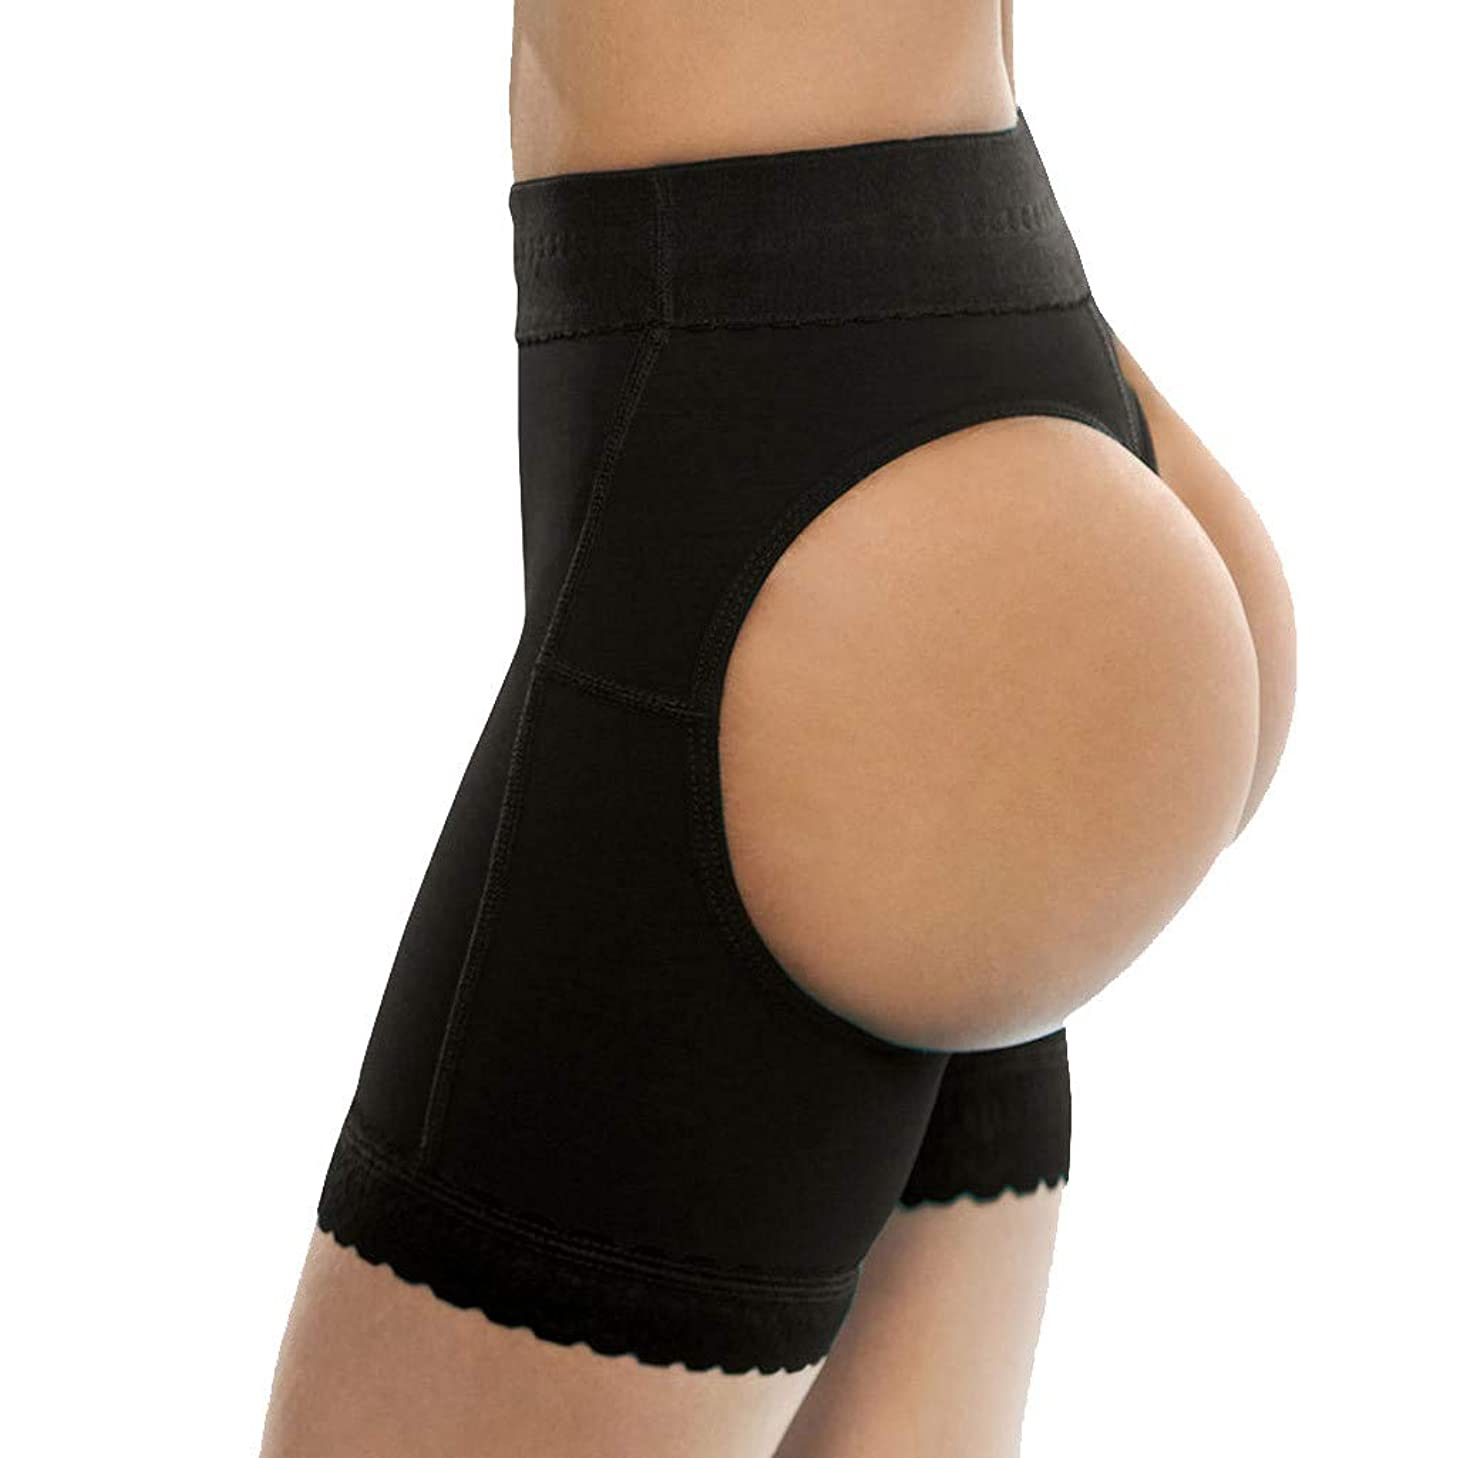 AmyDong Shapewear Shorts for Women Butt Lifter High Waist Tummy Control Panties Mid Thigh Slimmer Short